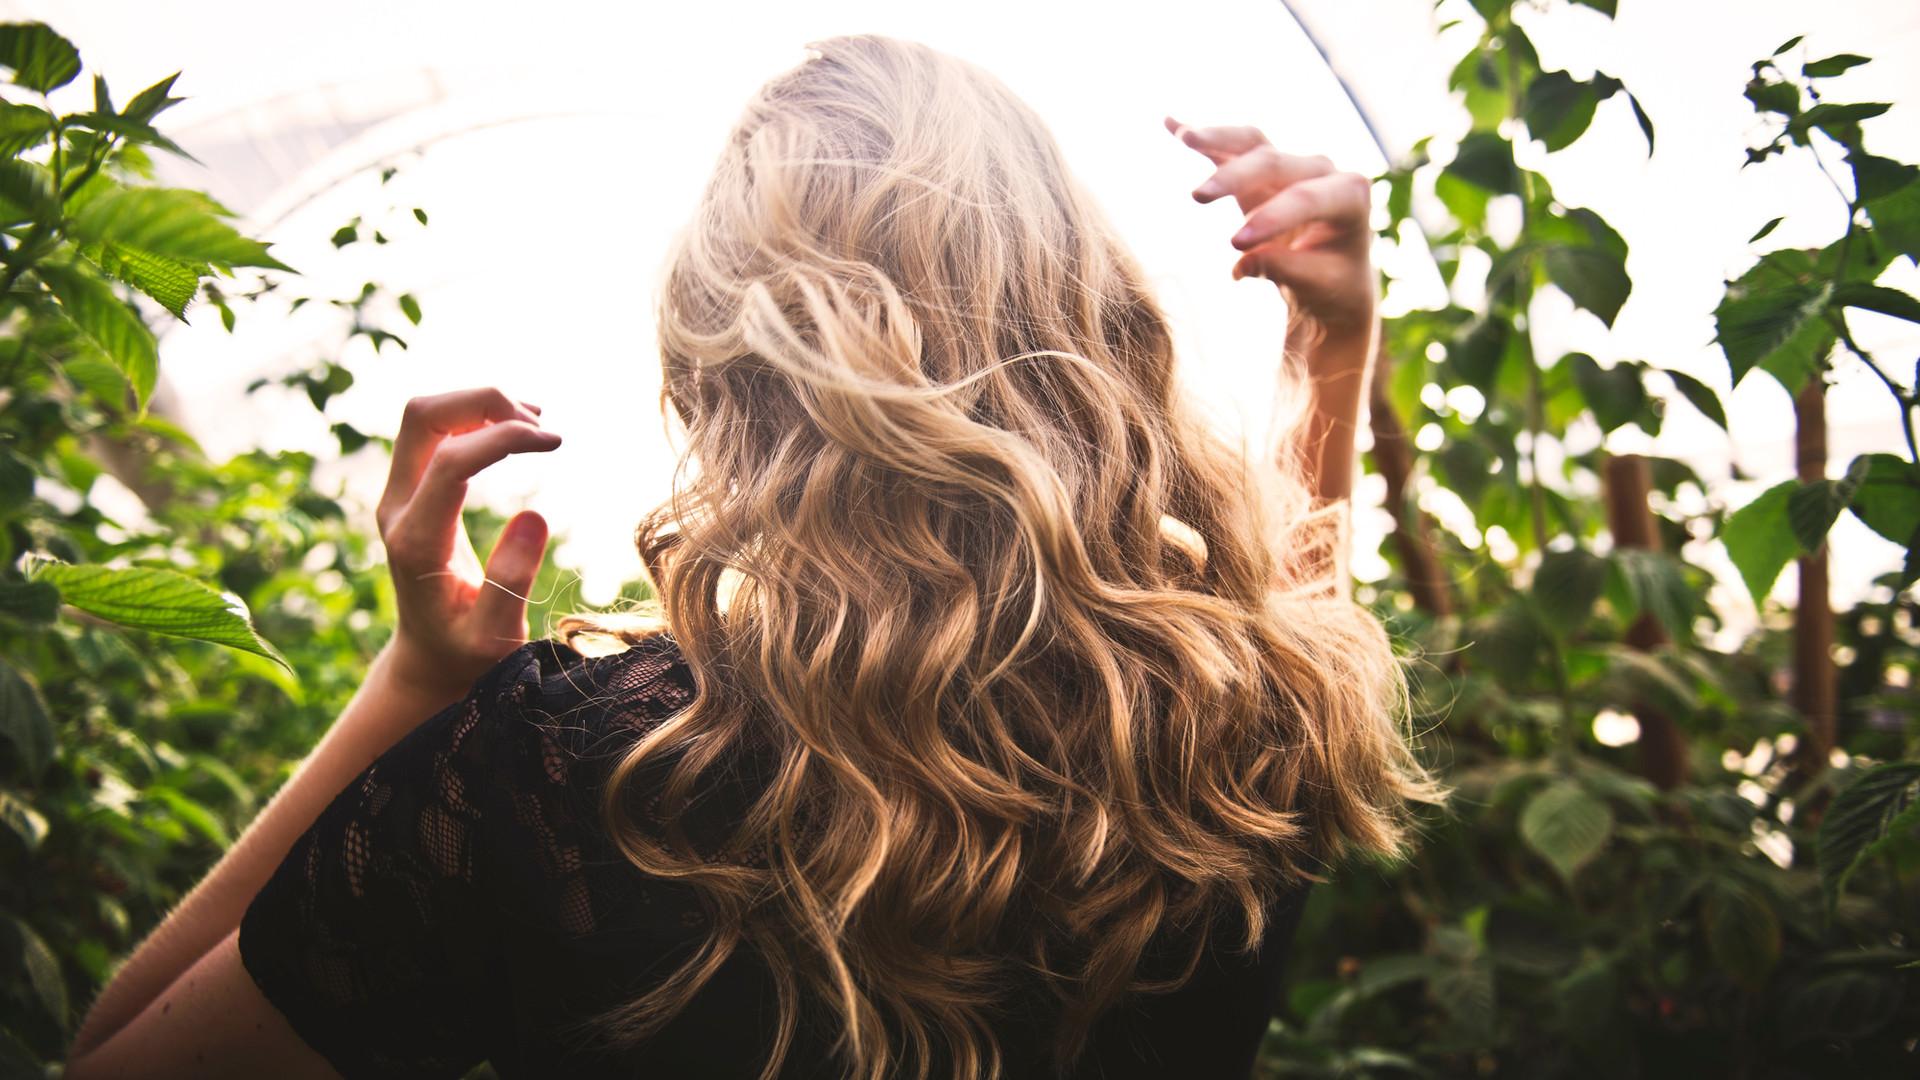 Blond Wavy Hair